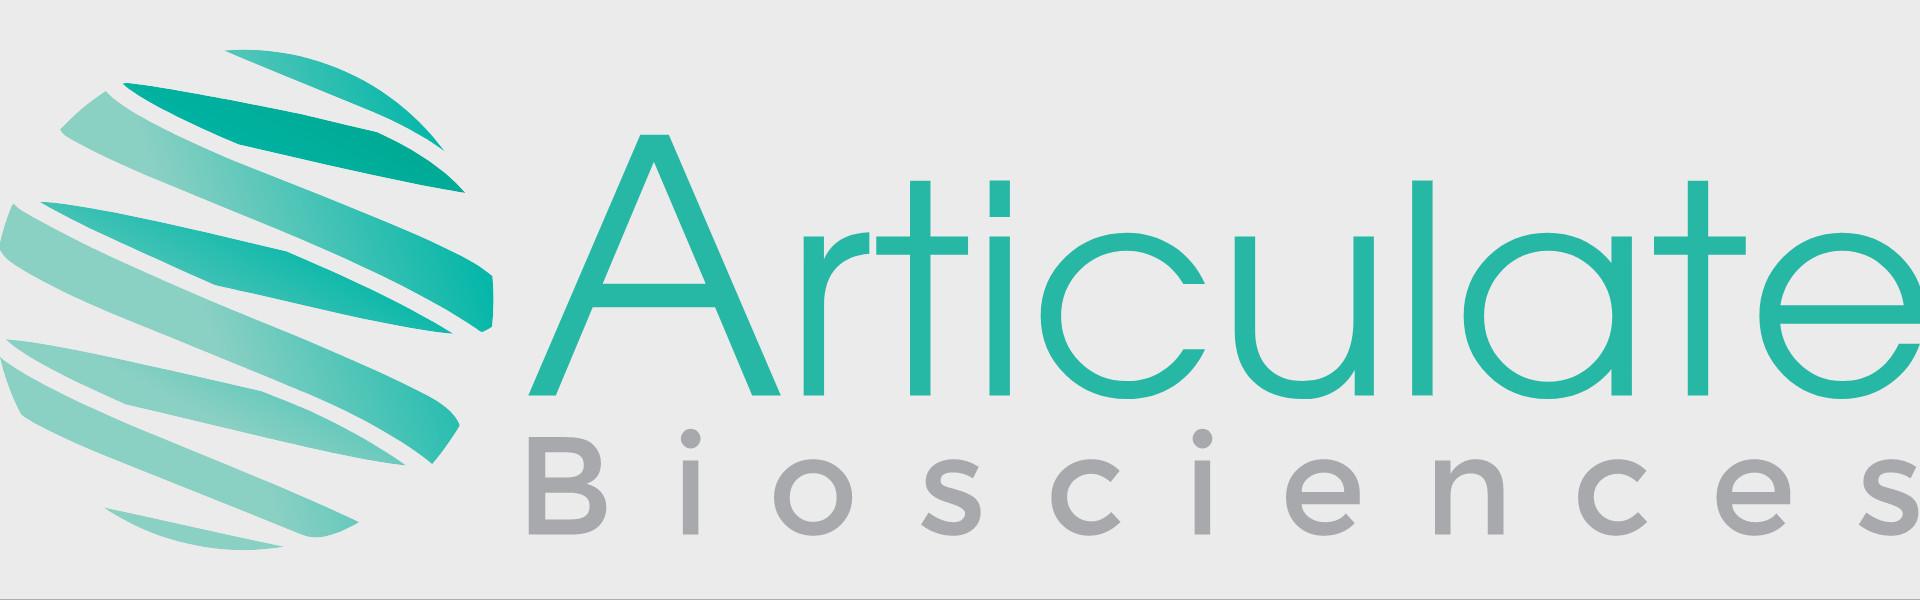 Articulate Biosciences